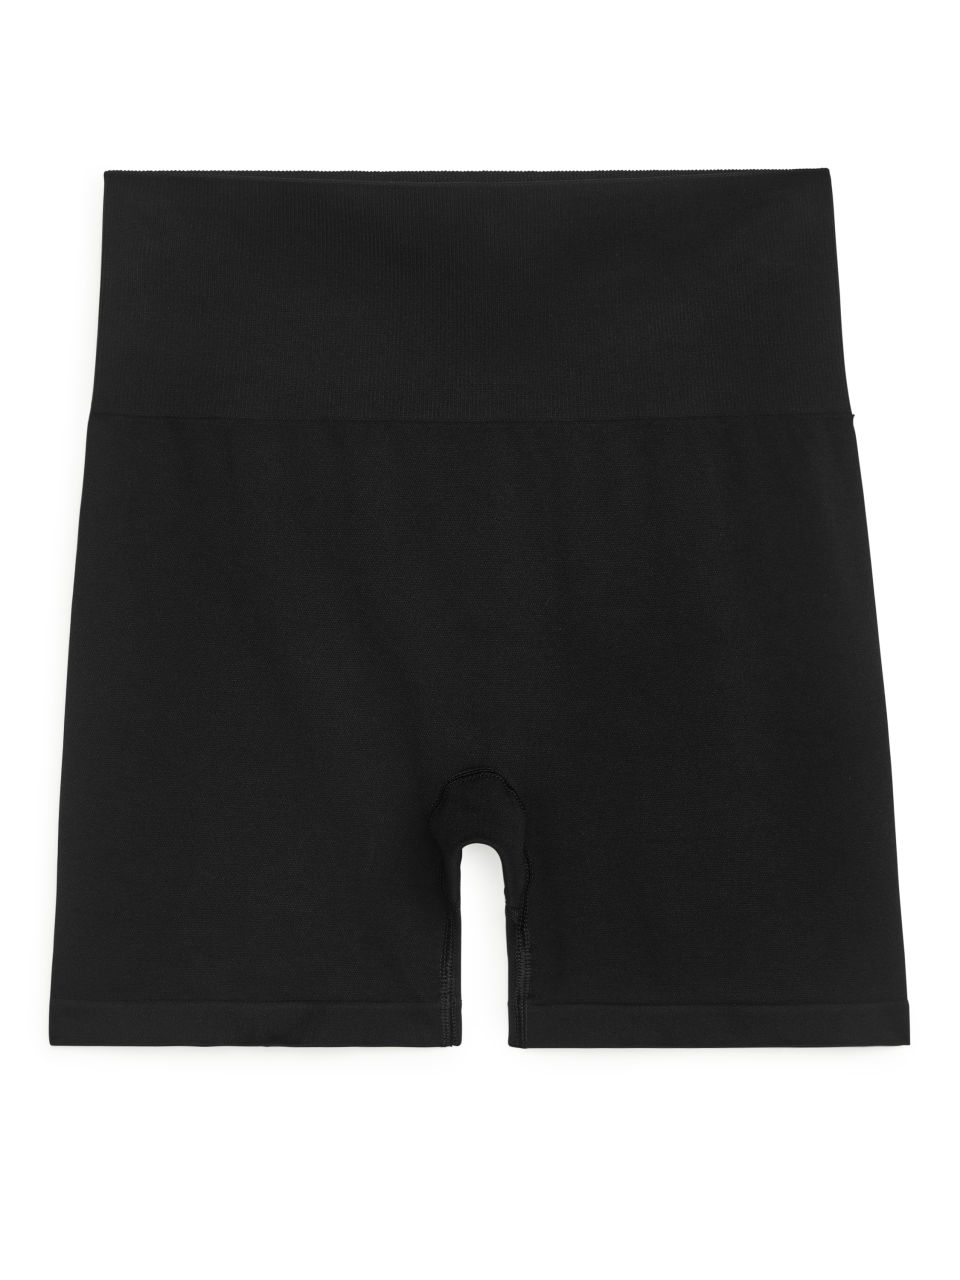 Seamless™ Yoga Shorts - Black